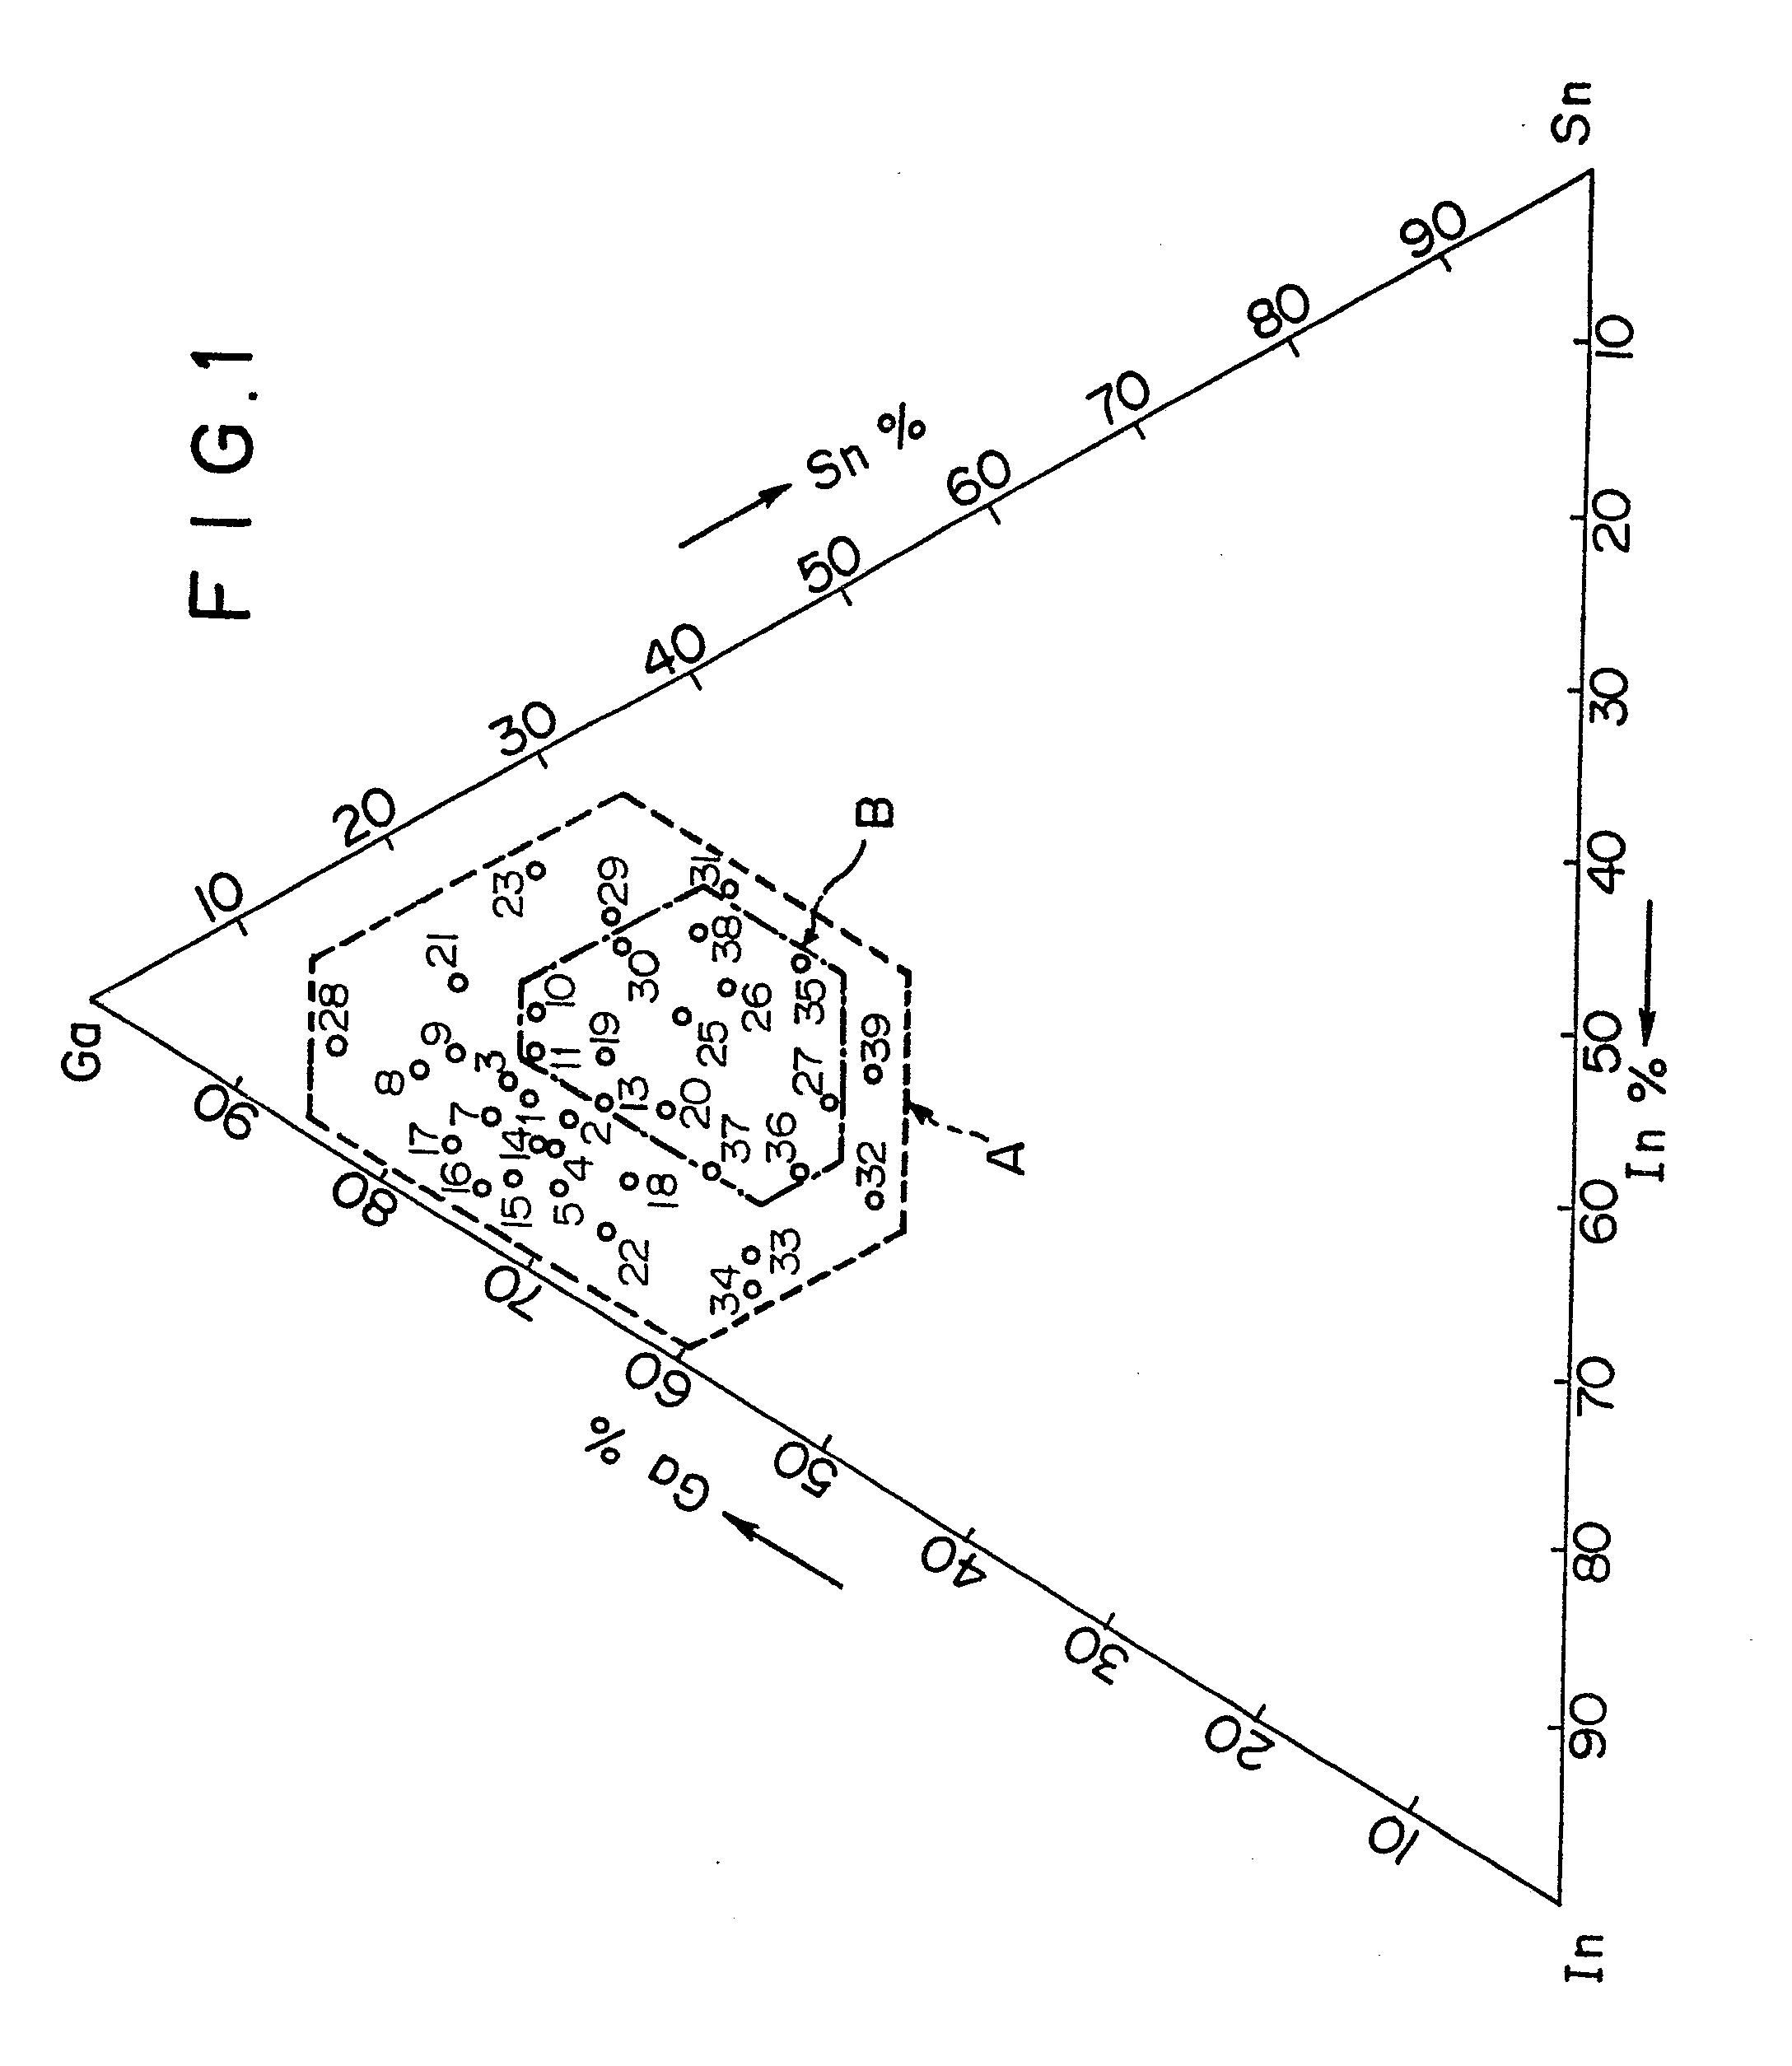 patent ep0173806a2